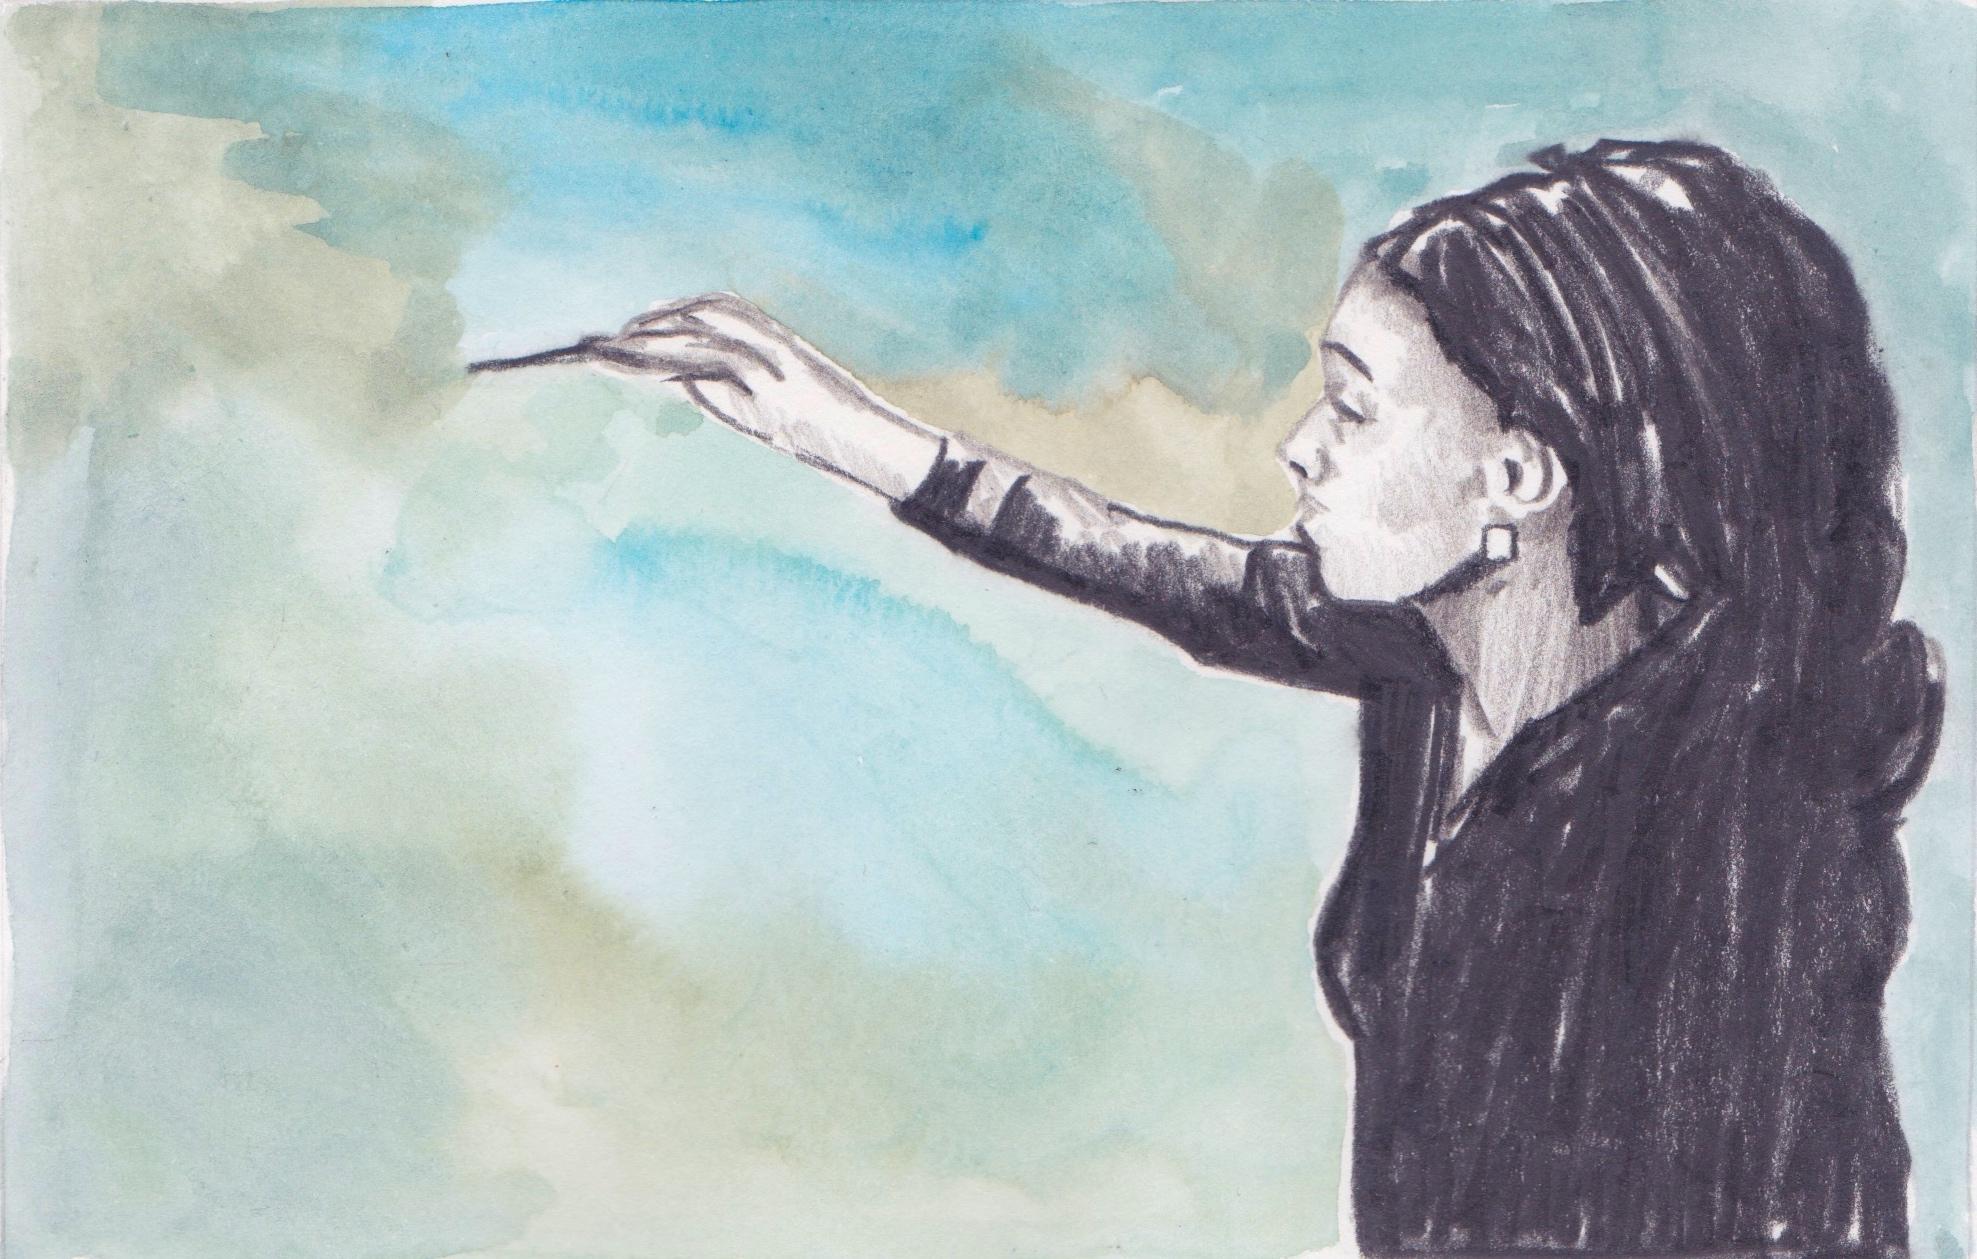 20/05/15 Award-winning Congolese artists Rhode Bath-Scheba Makoumbou displays her paintings at an exhibition in Brussels